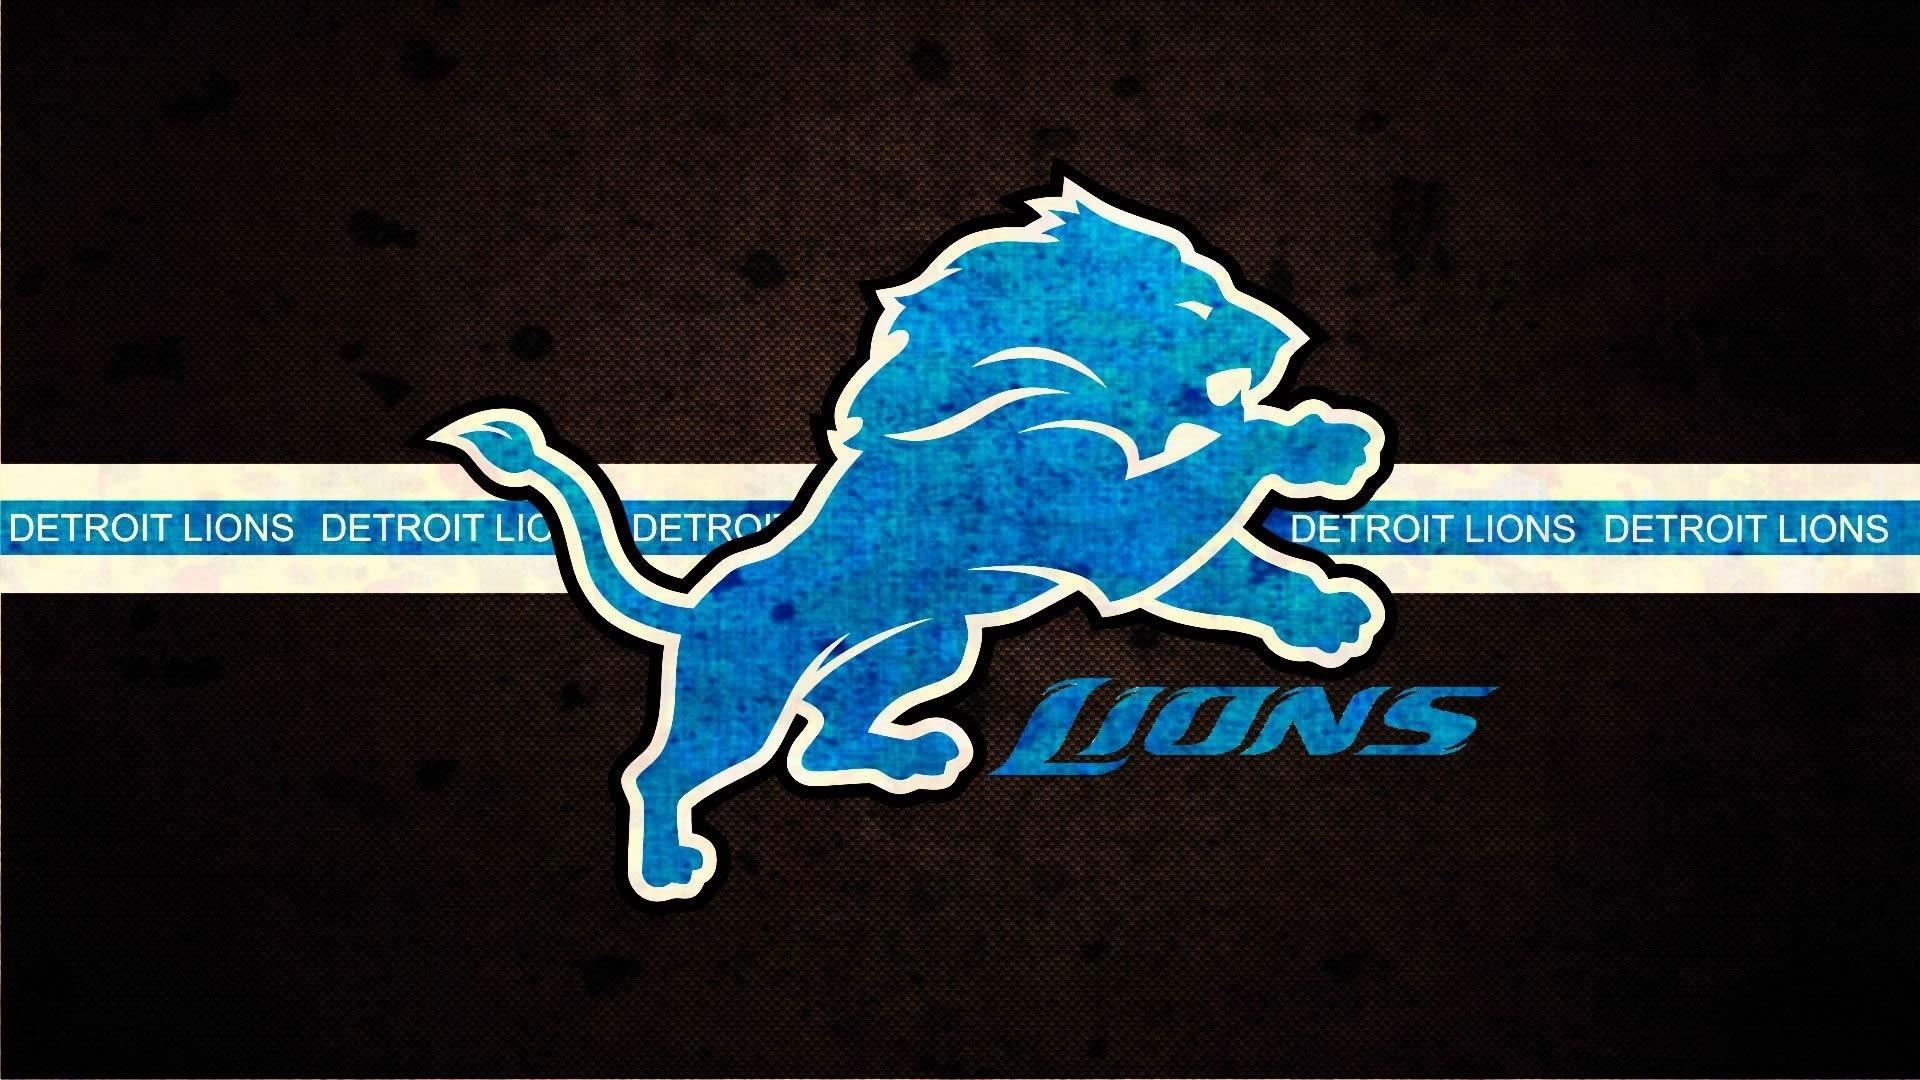 fond d'écran : logo, nfl, football américain, detroit lions, police